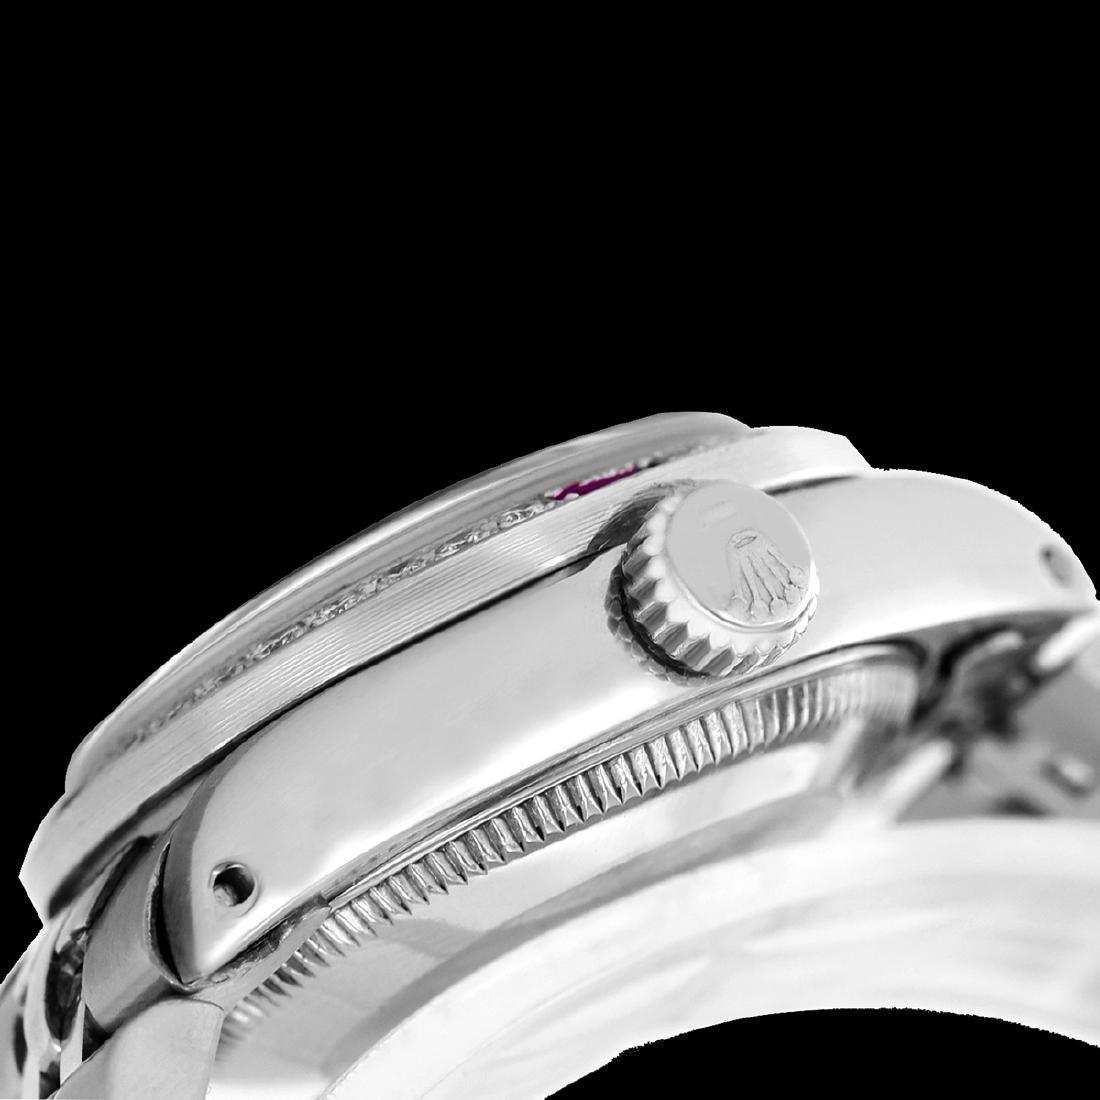 Rolex Men's Stainless Steel, QuickSet, Diam/Ruby Dial & - 3